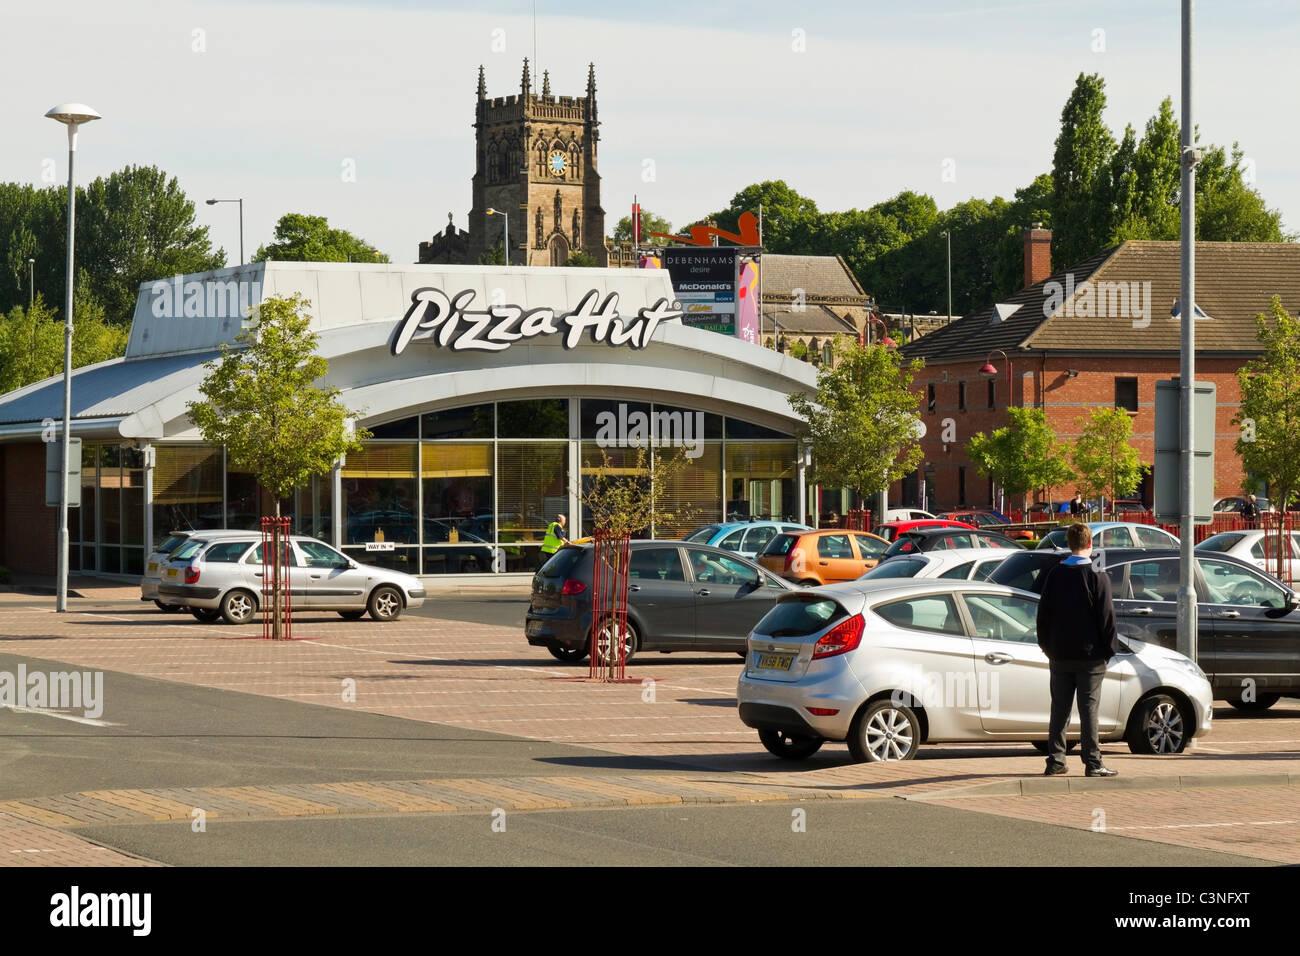 Pizza Hut Fast Food Restaurant In Kidderminster Stock Photo